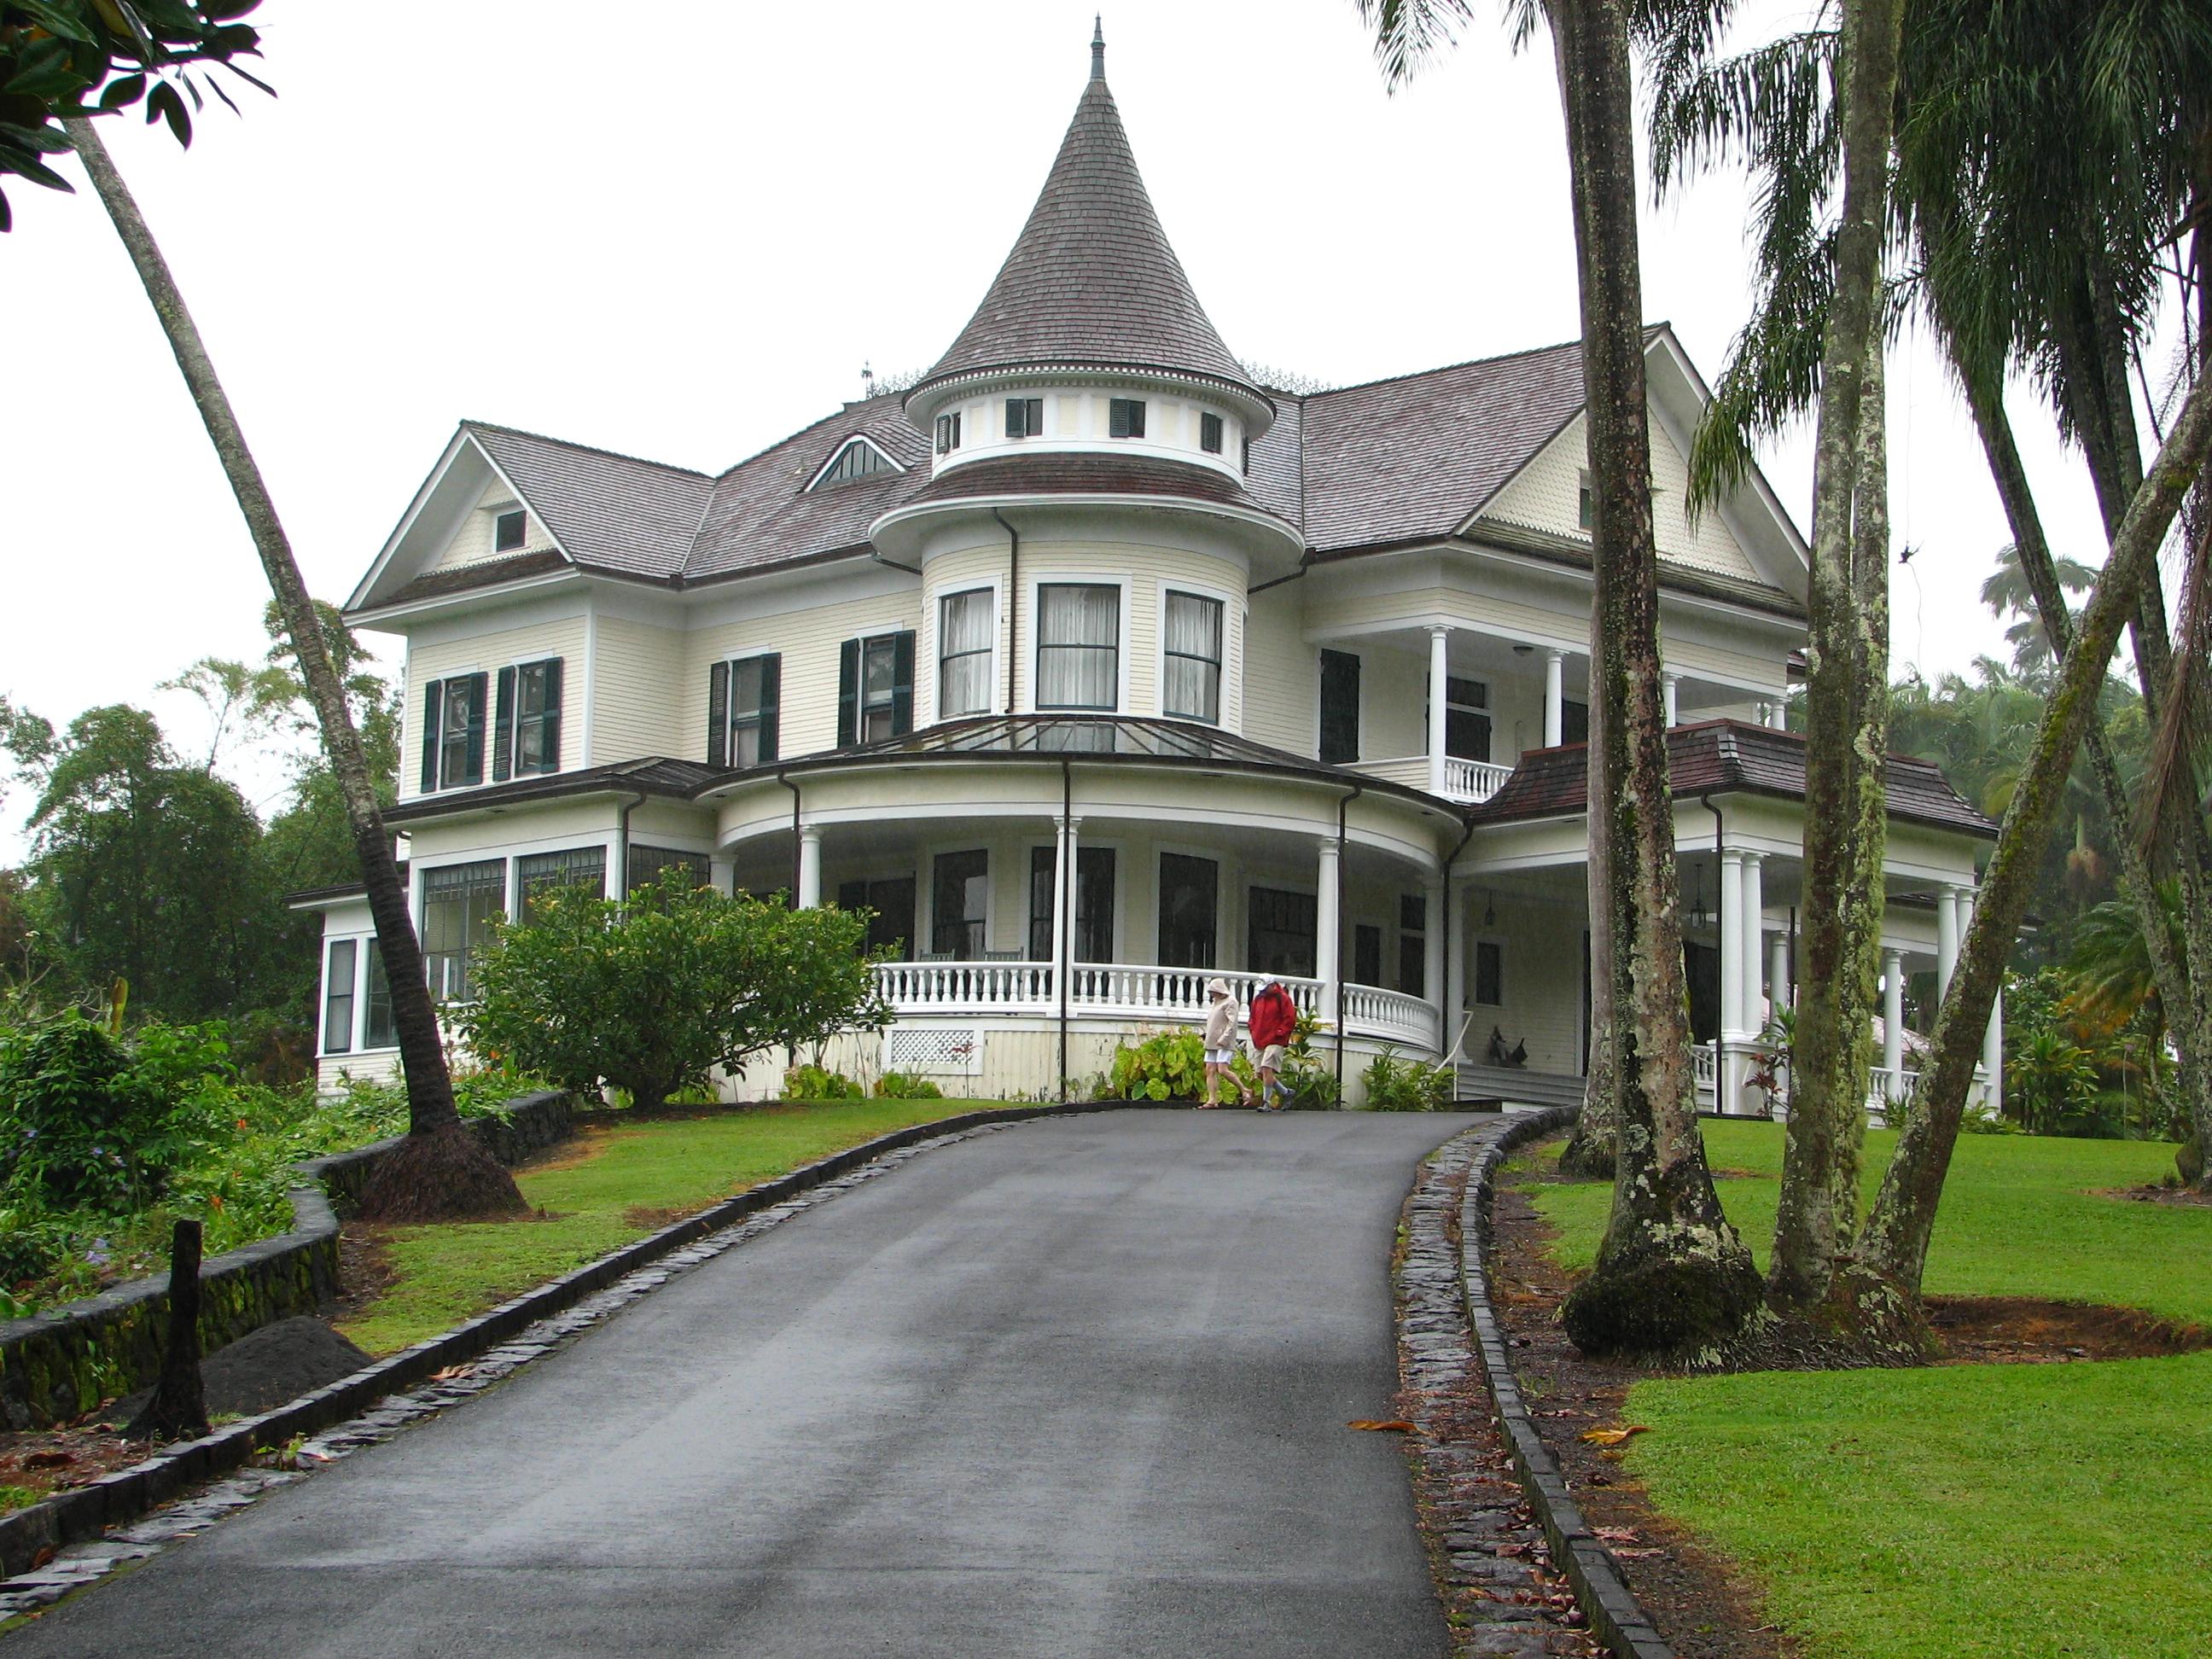 Shipman House Bed and Breakfast Inn